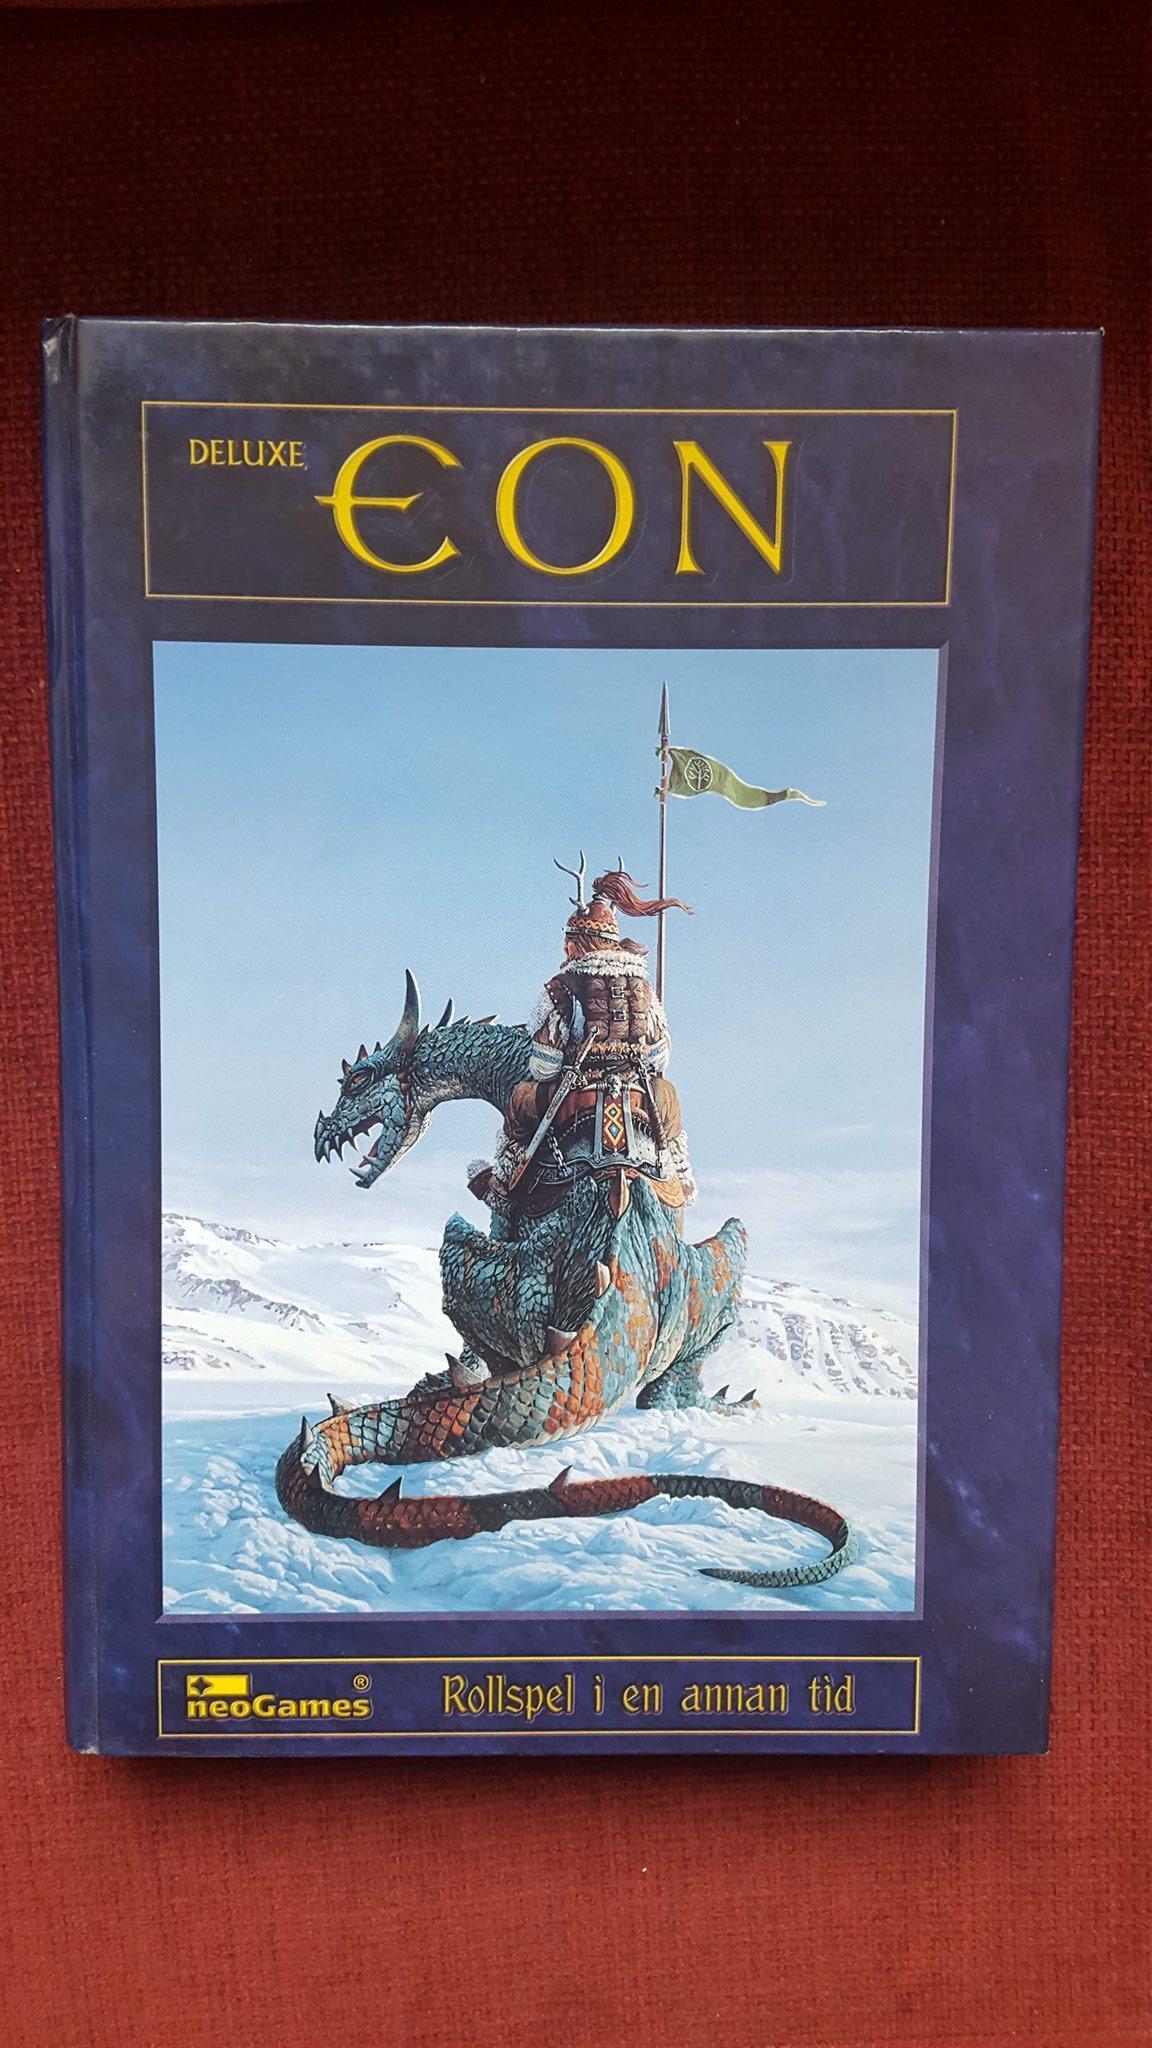 Eon Deluxe Edition Monster Varelser Sl Sk 337723215 ᐈ Kop